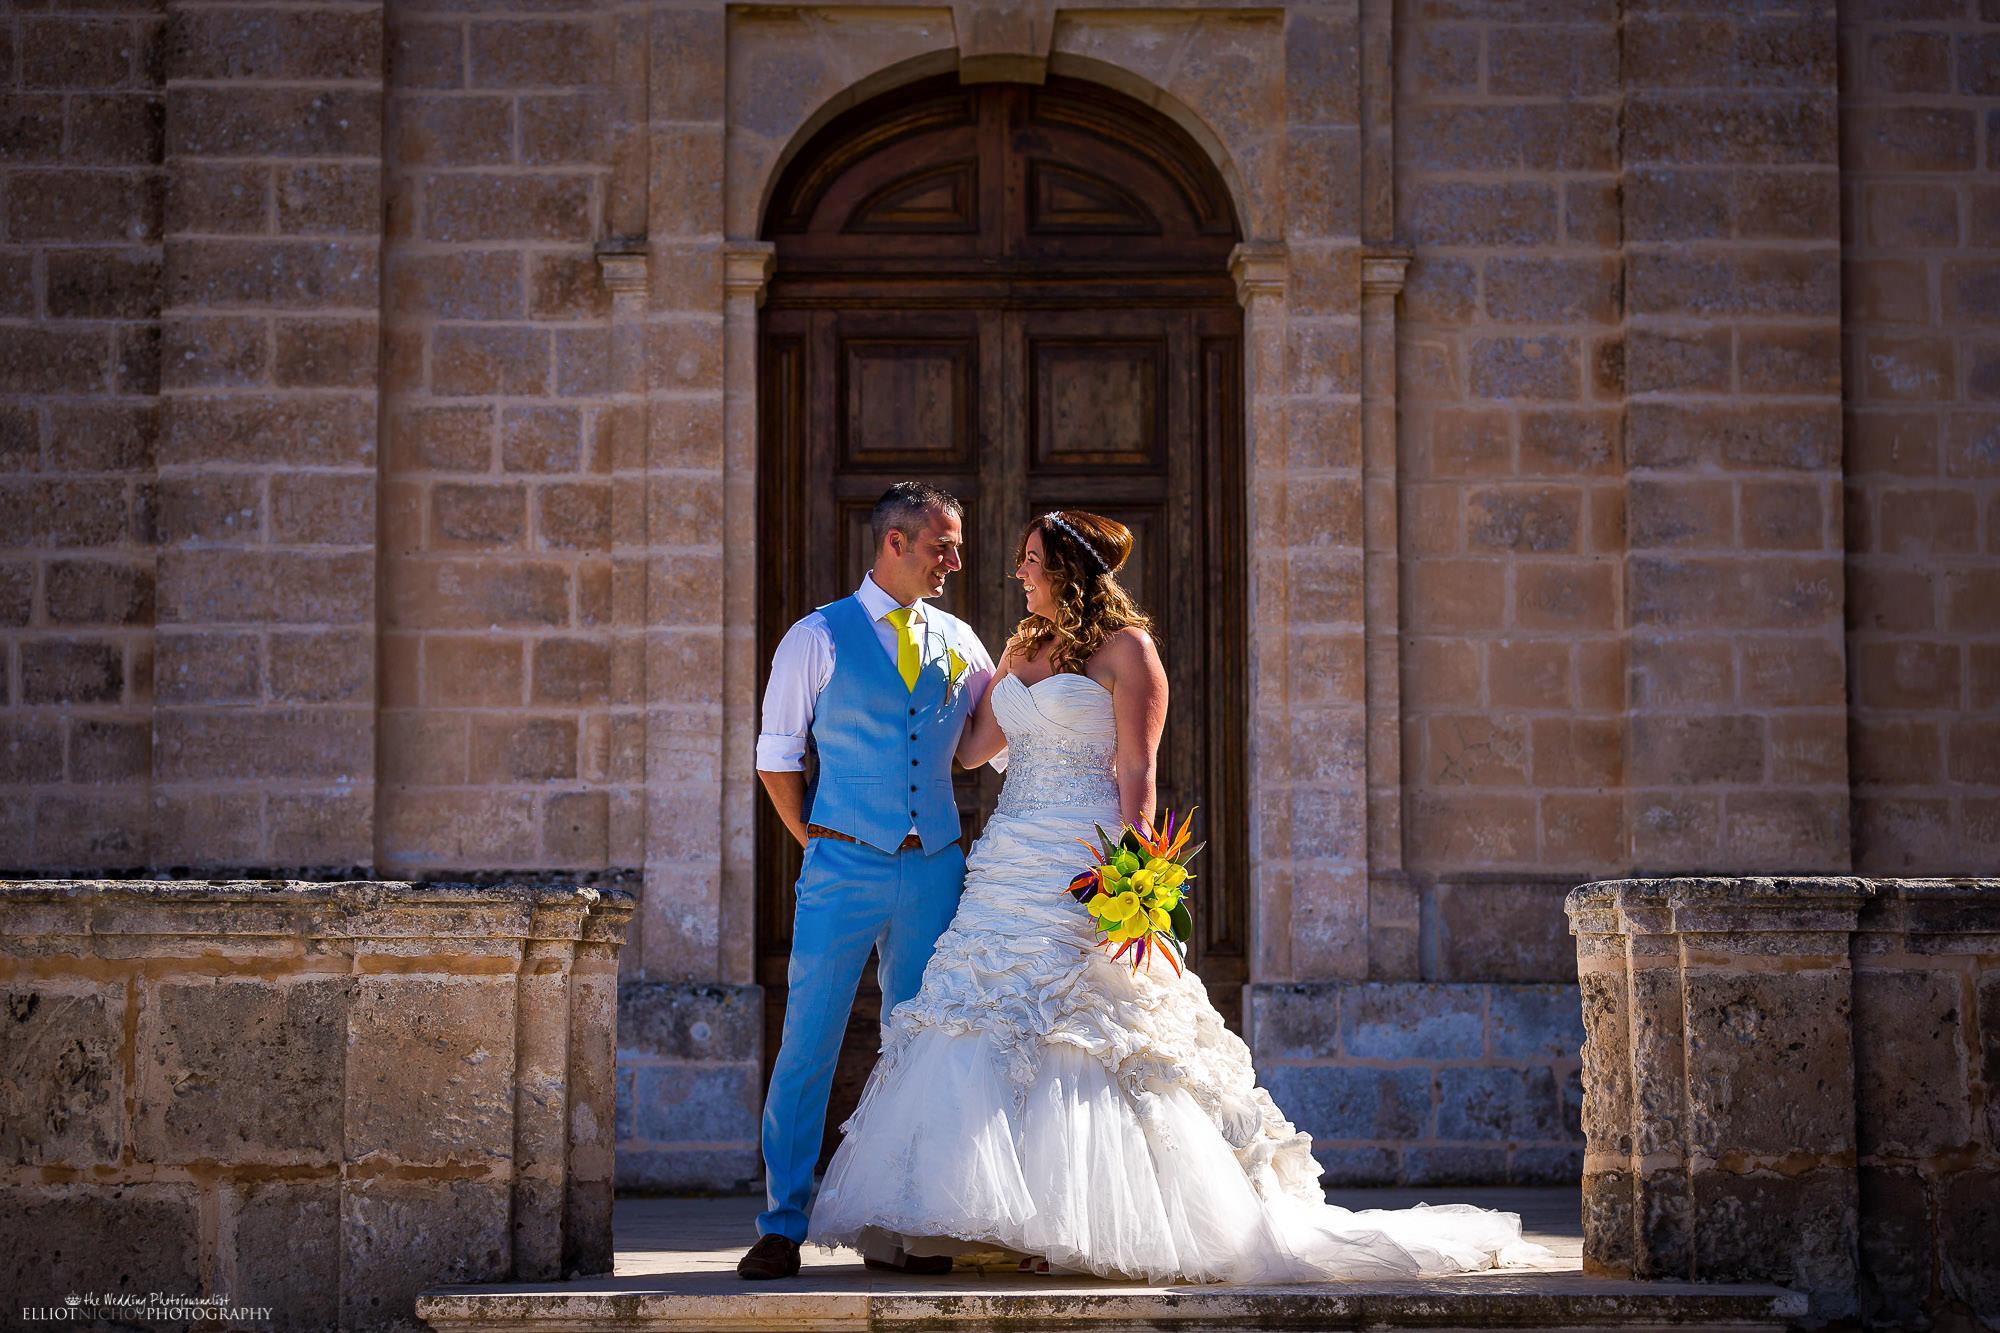 portrait-bride-groom-newlyweds-destination-photography